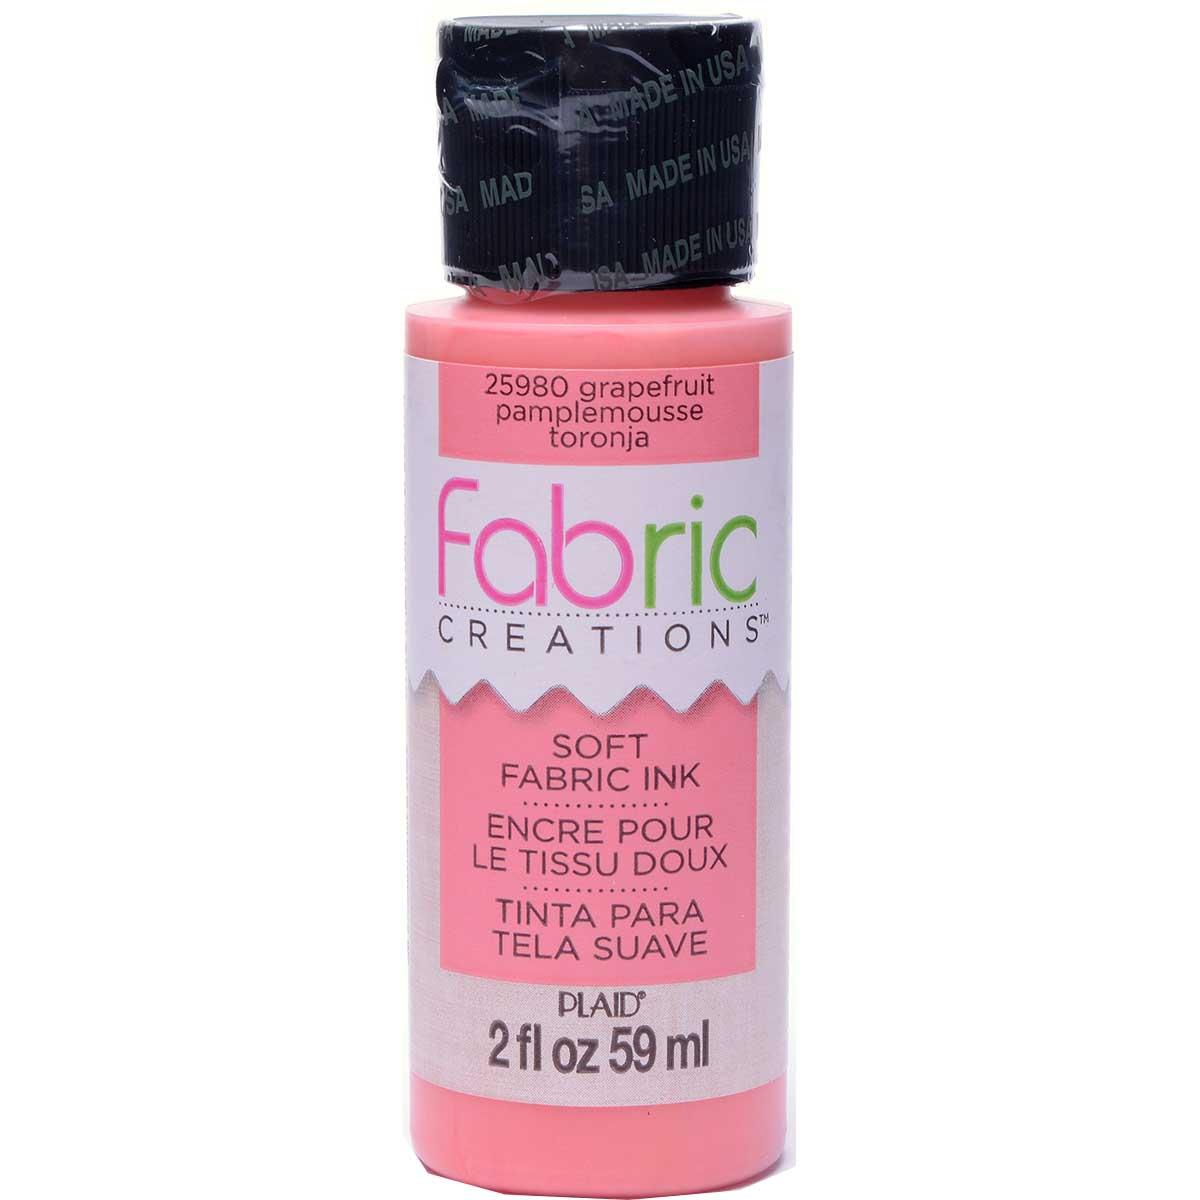 Fabric Creations™ Soft Fabric Inks - Grapefruit, 2 oz.